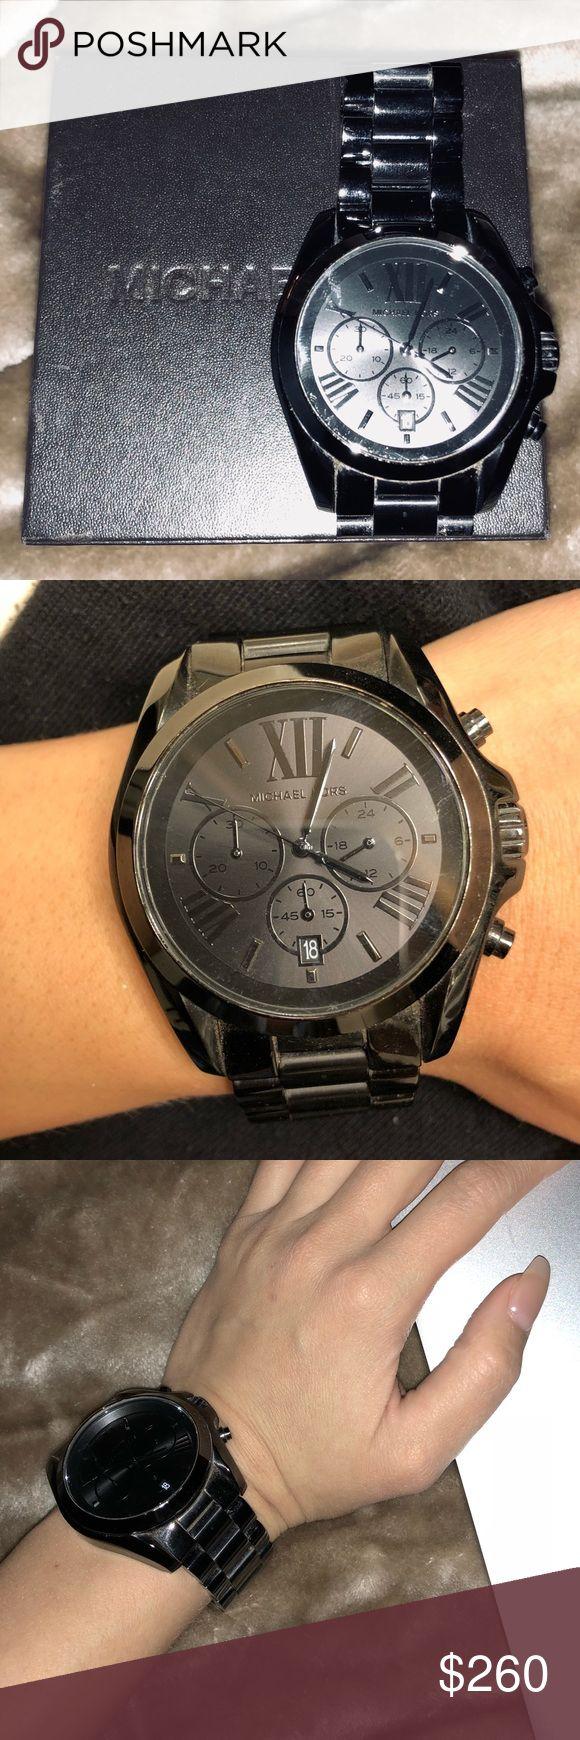 Michael Kors watch Black Michael Kors watch (Roman numerals) Michael Kors Accessories Watches